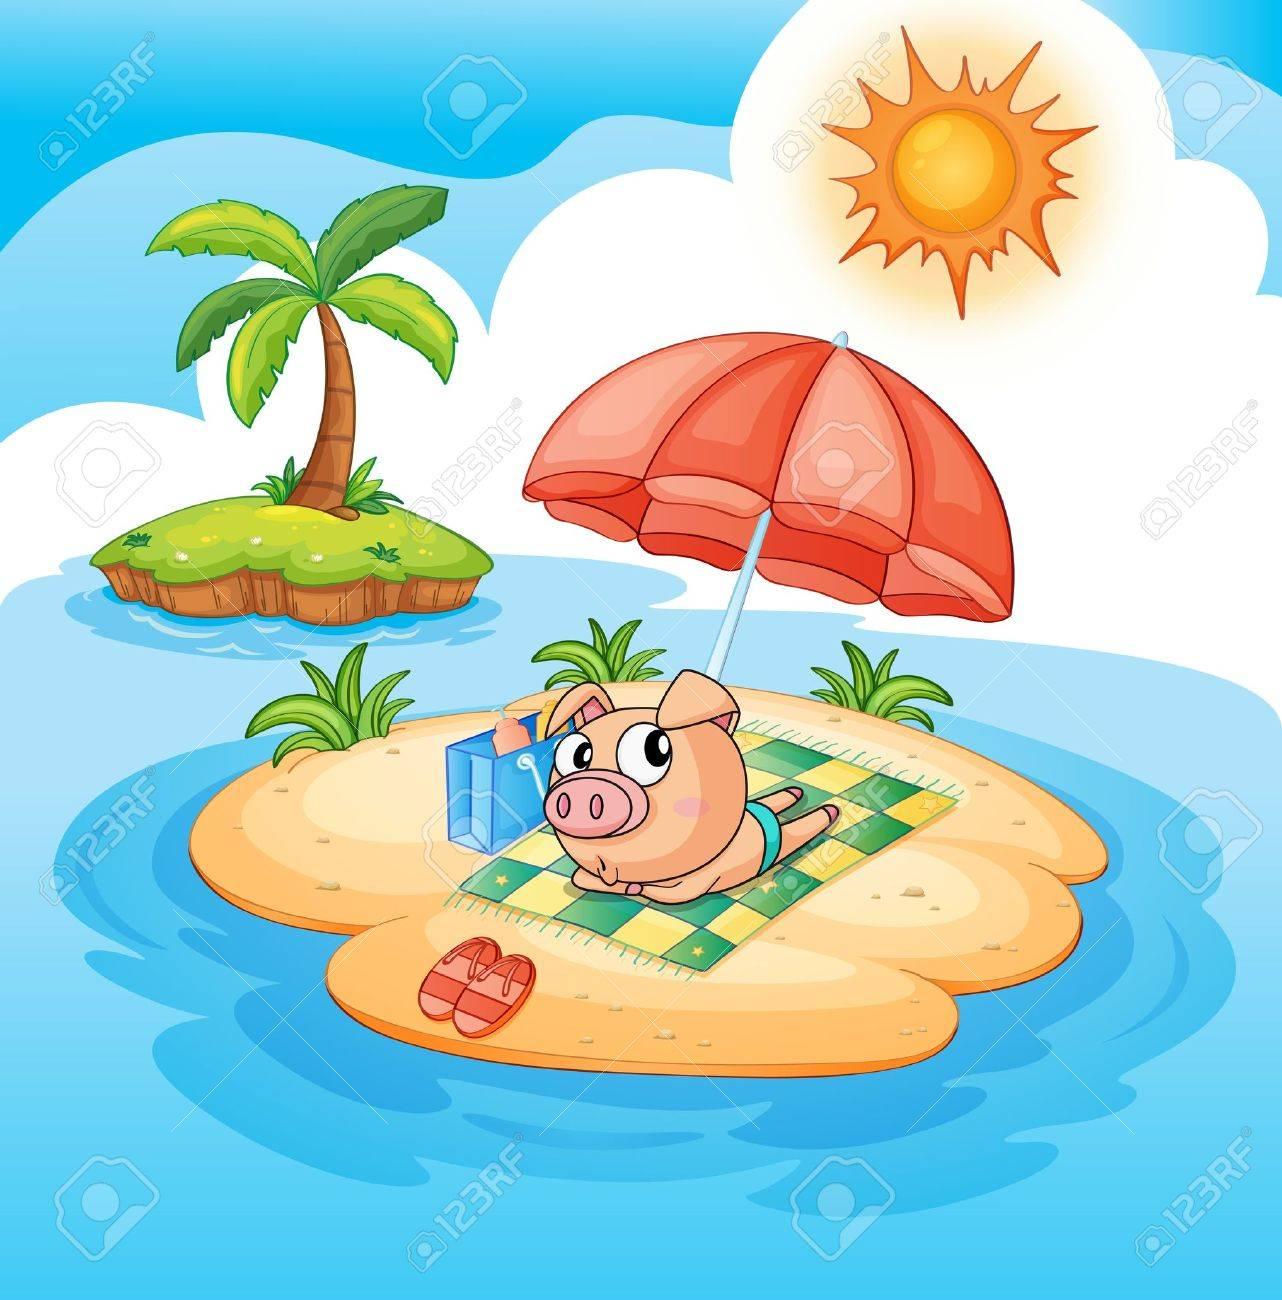 illustration of a pig sun baking Stock Vector - 13700112